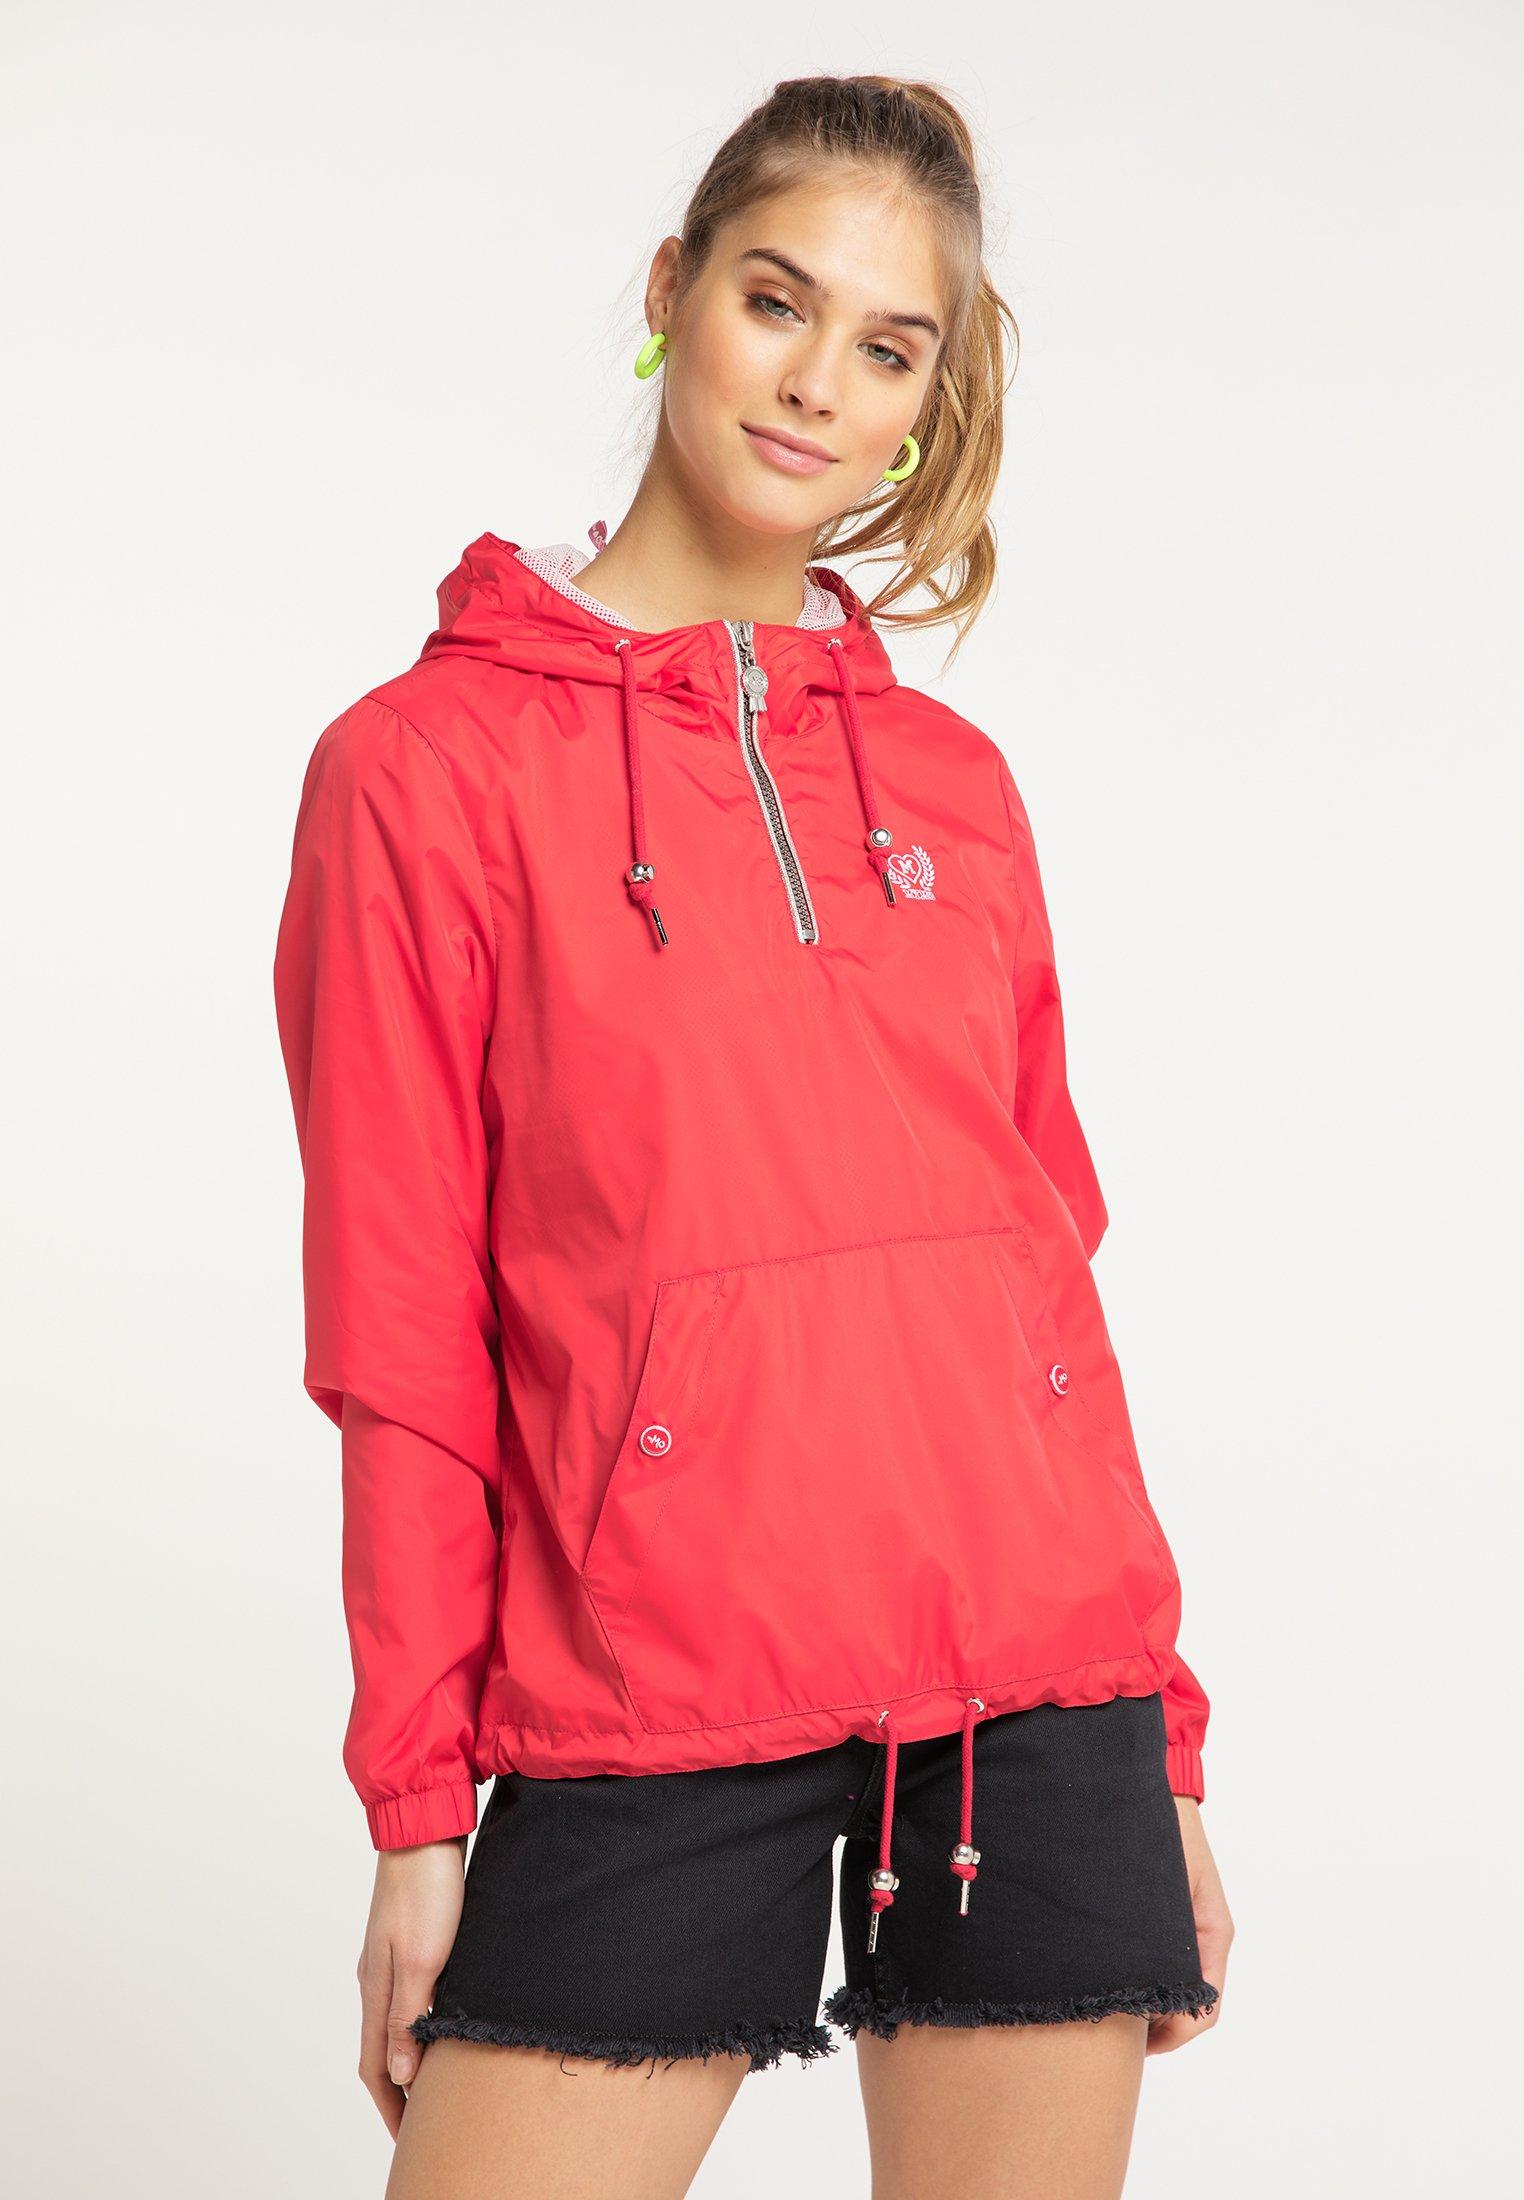 Limit Offer Cheap Women's Clothing myMo Windbreaker red A4NzB6Upu